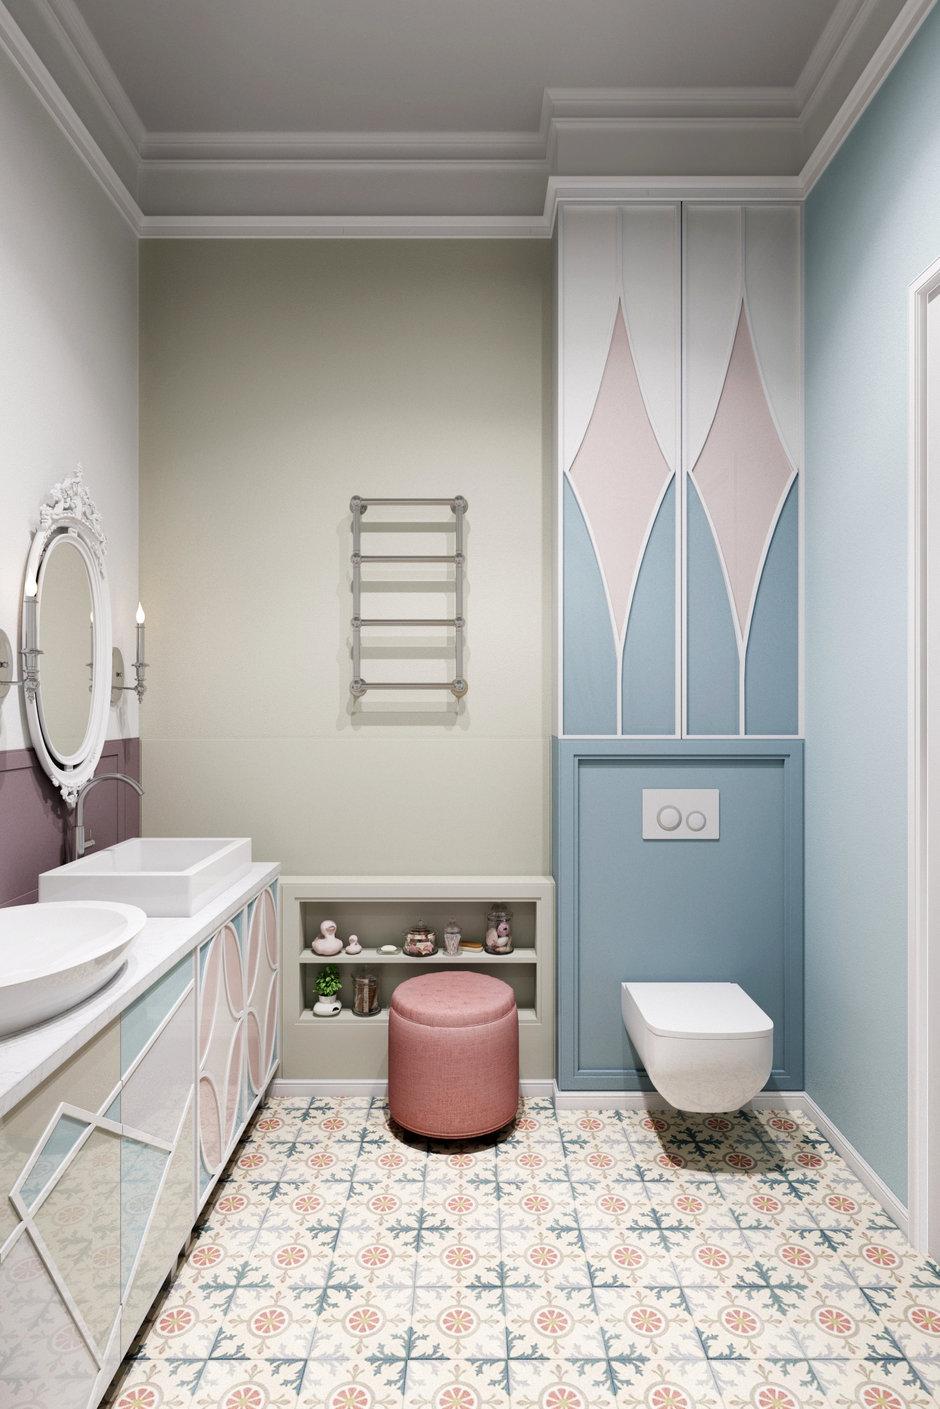 Фотография:  в стиле , Квартира, Проект недели, Москва, Светлана Гаврилова, 3 комнаты, Более 90 метров – фото на InMyRoom.ru